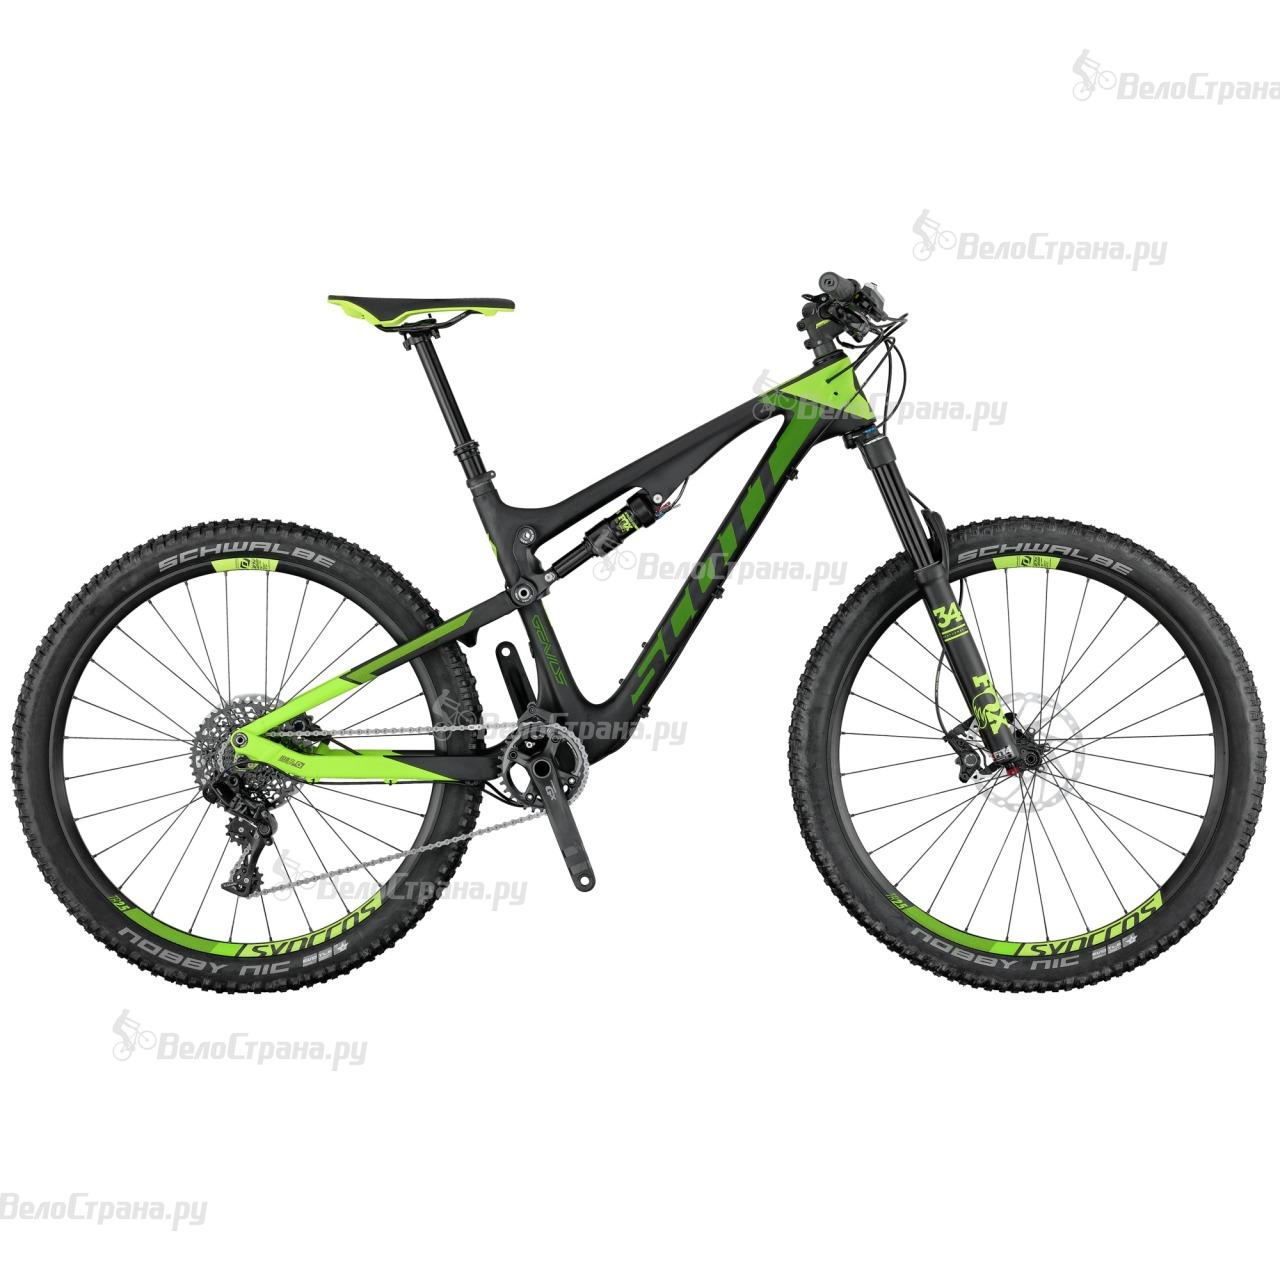 Велосипед Scott Genius 920 (2017) genius hs 300a silver